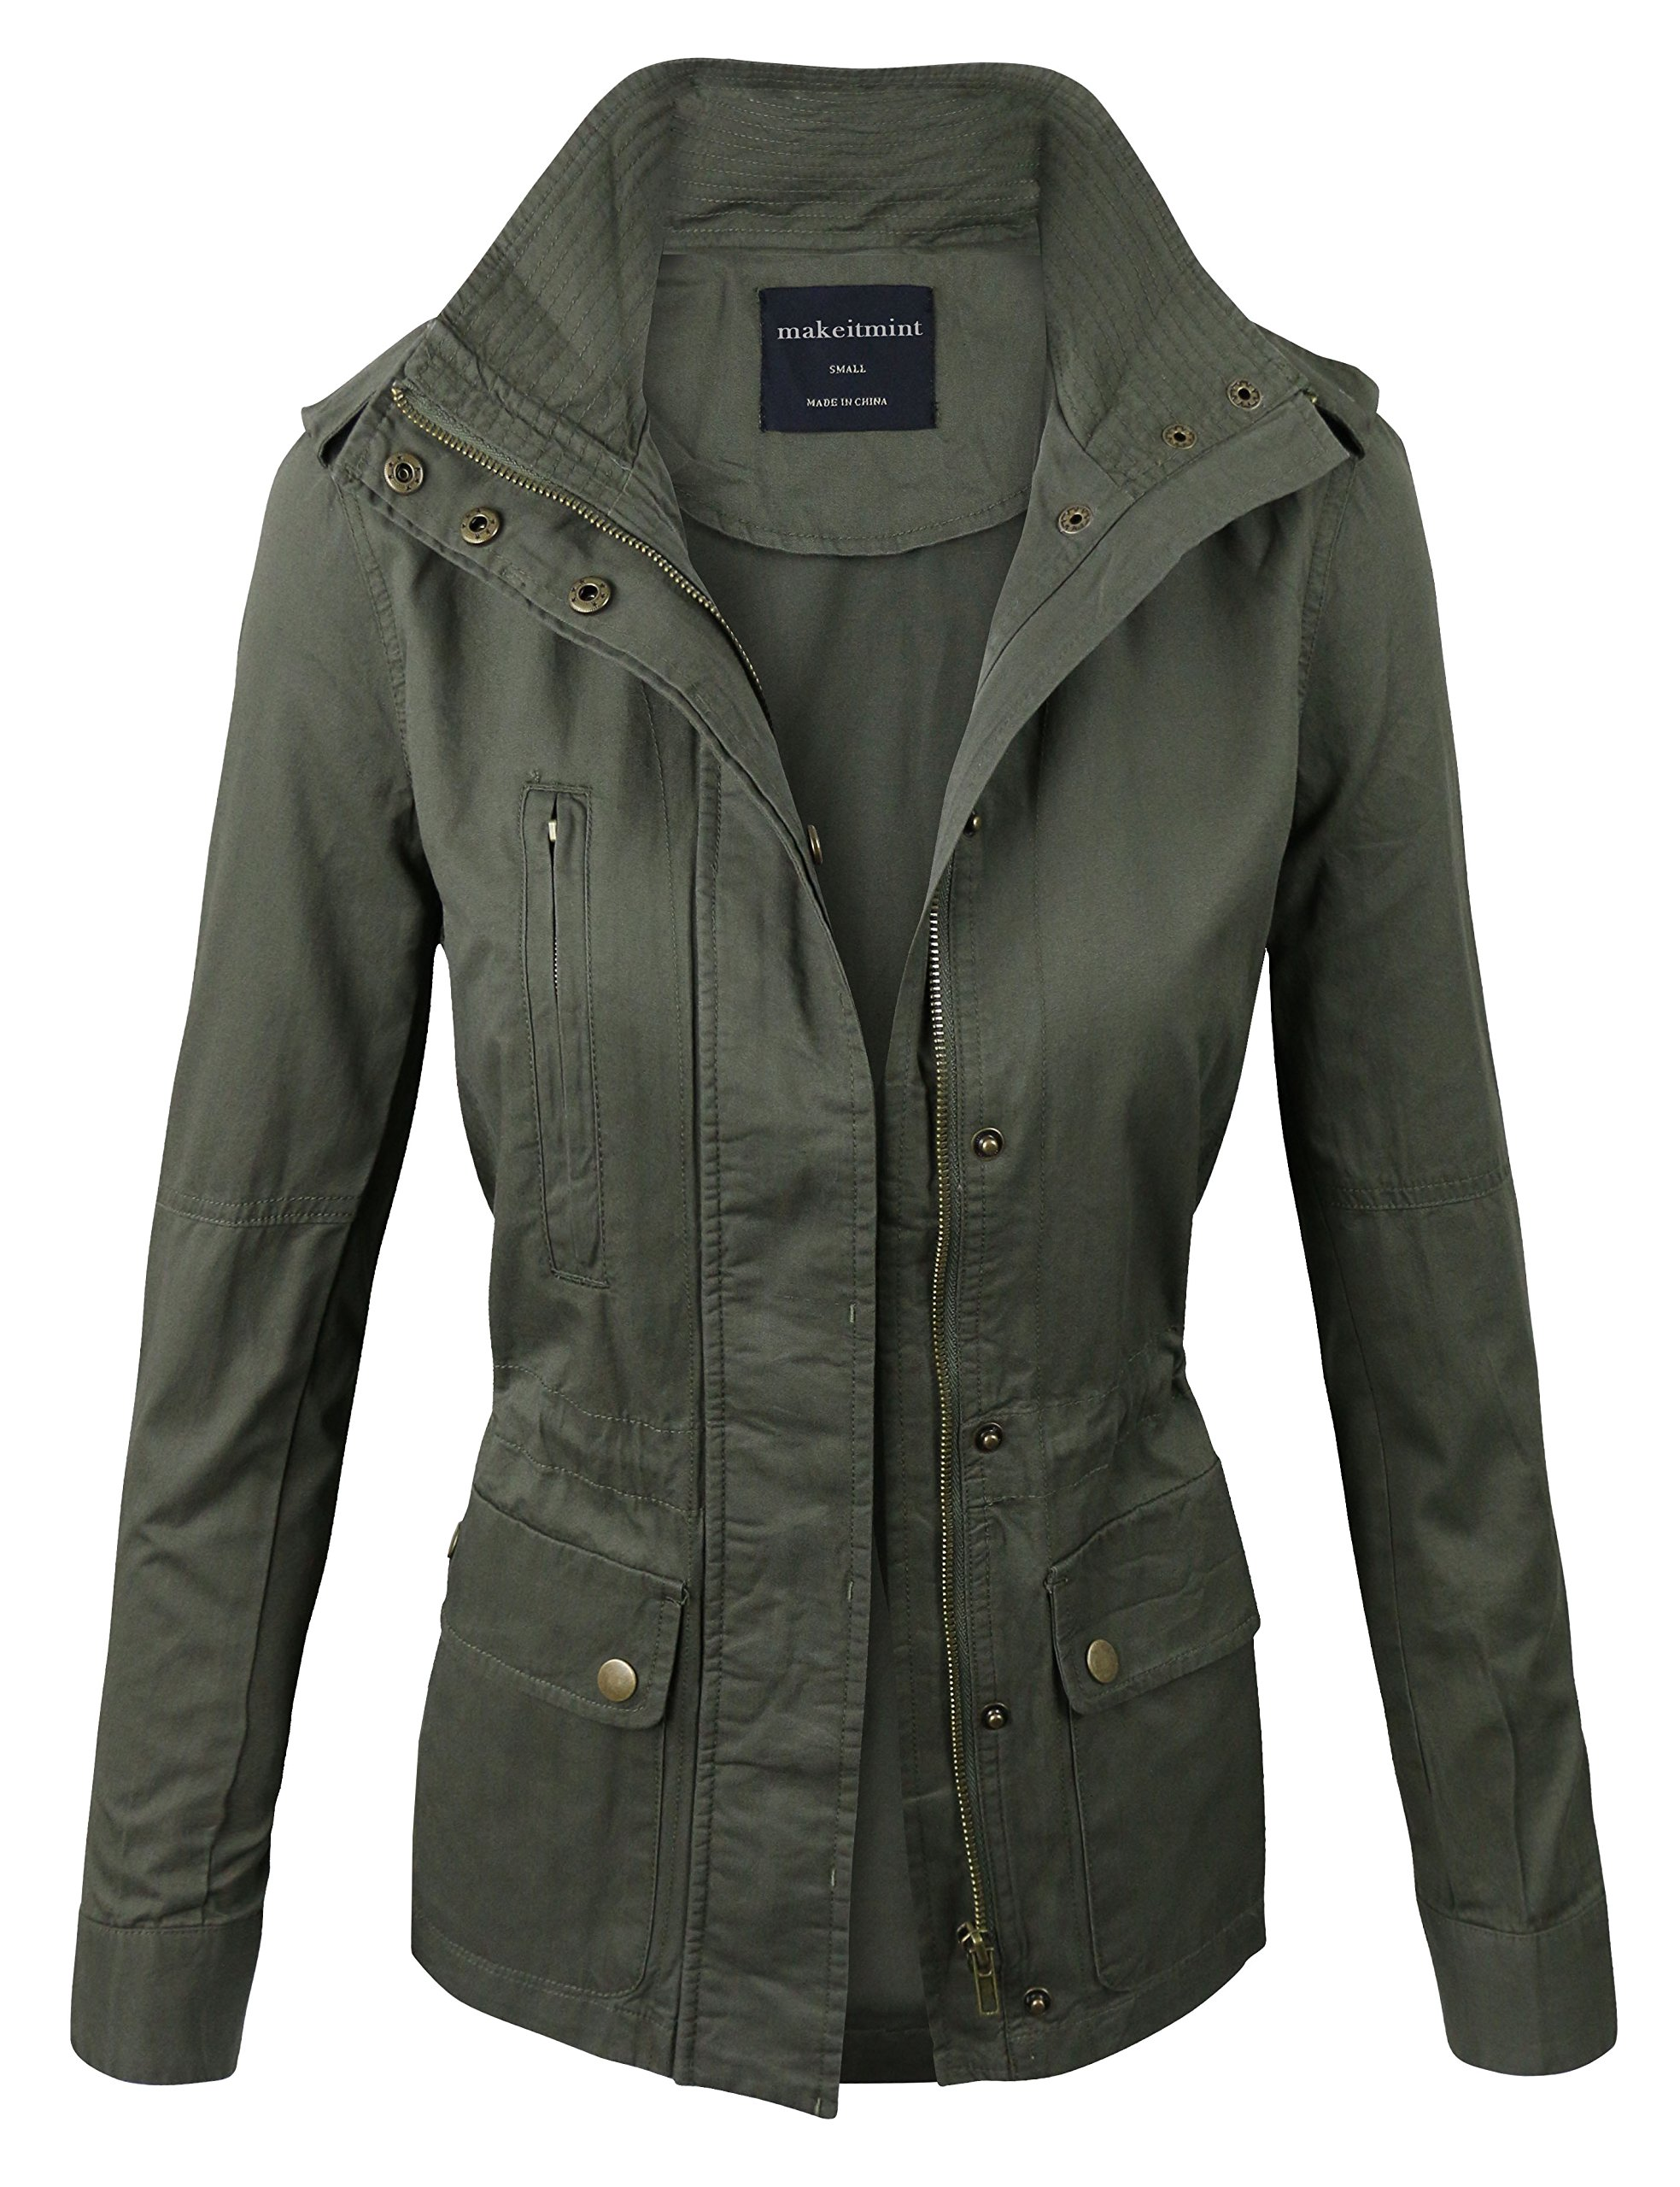 makeitmint Women's Zip Up Military Anorak Jacket w/Pockets Medium Olive